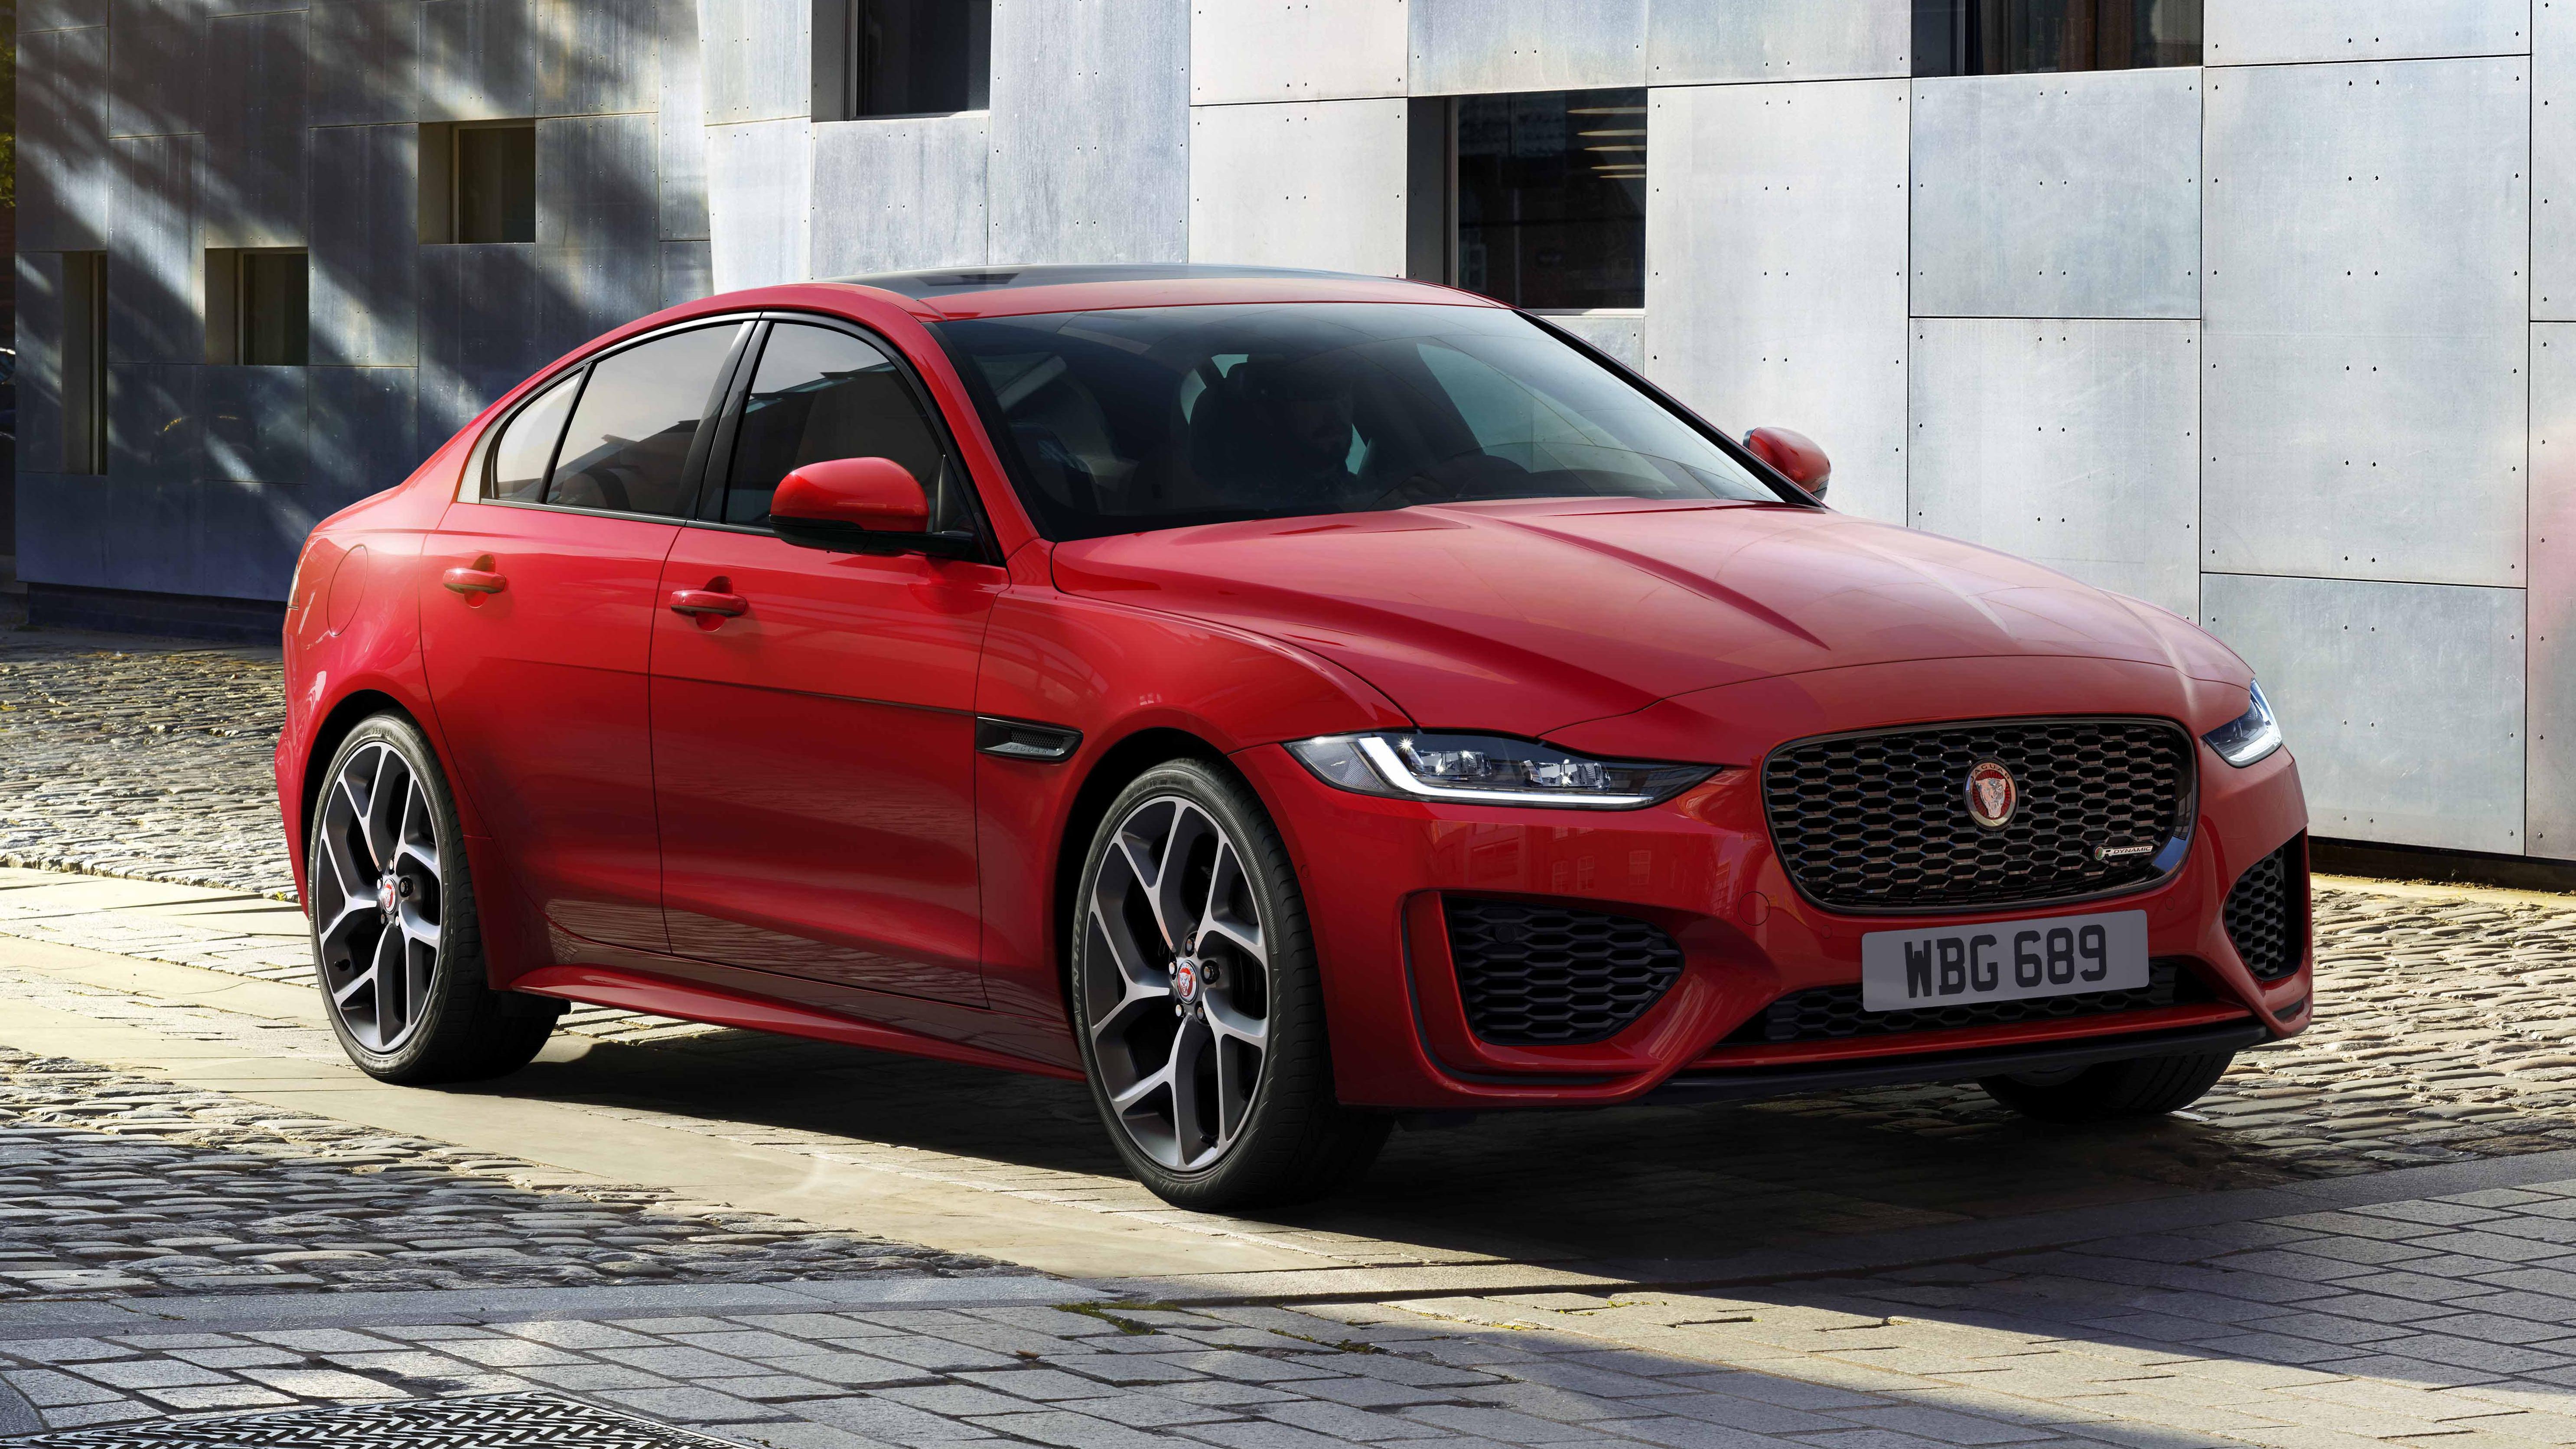 2020 All Jaguar Xe Sedan Price